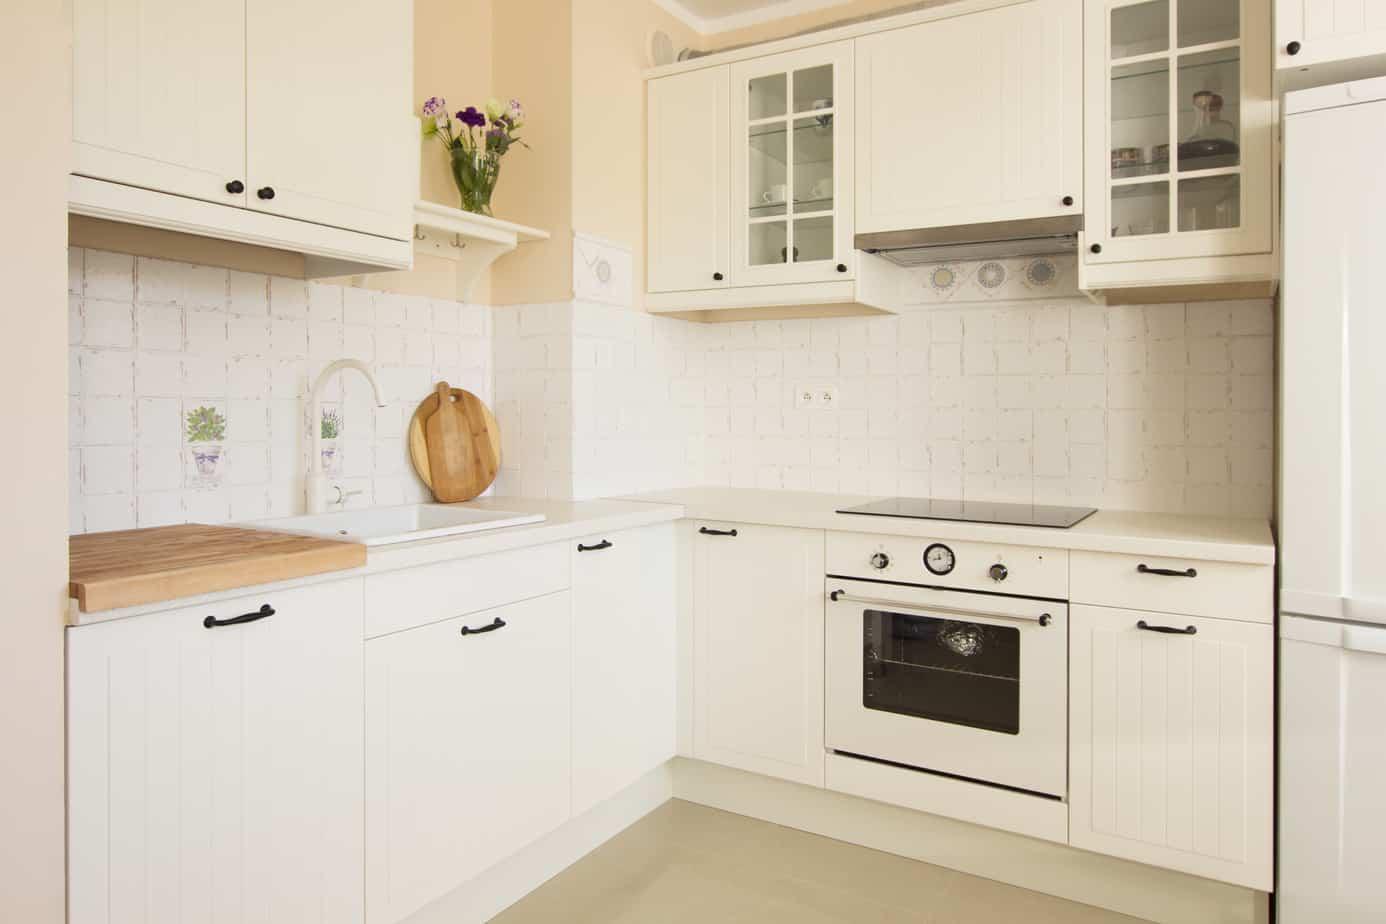 kitchen Renovations Coquitlam - Home Repair, Renovations & Water ...